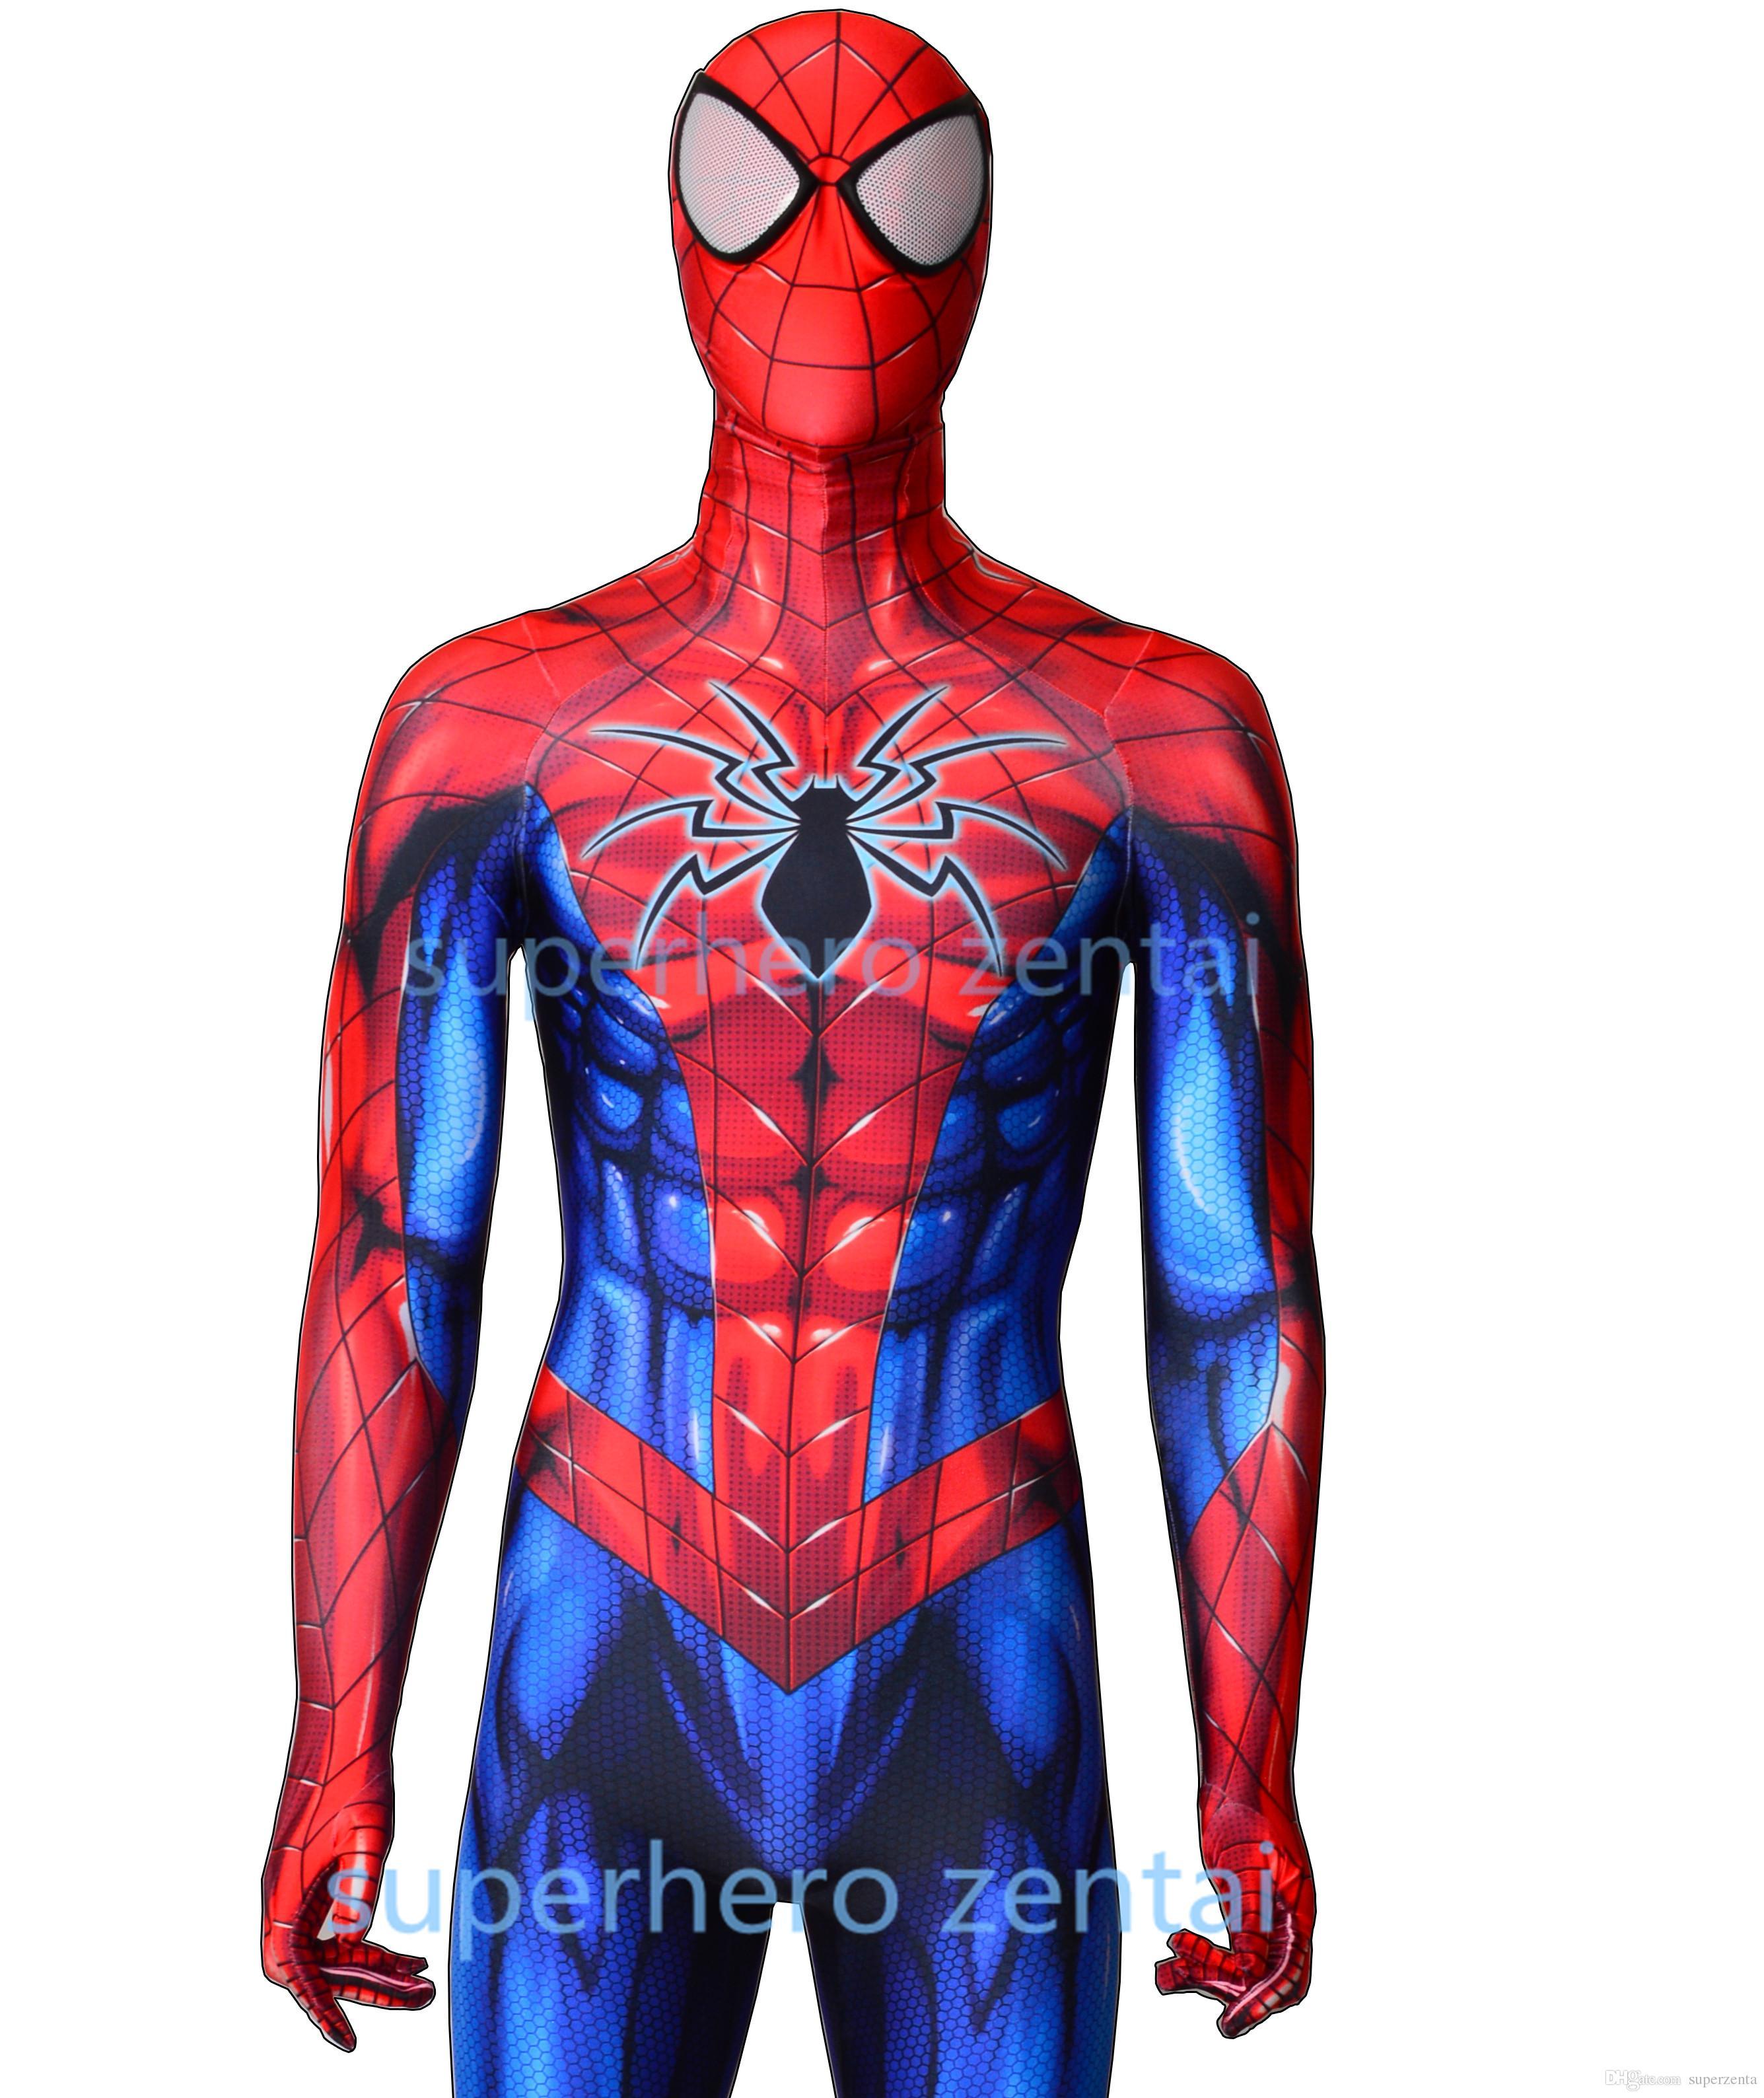 Newest Spiderman Costume Movie Cosplay Zentai Spandex Bodysuit Halloween Spiderman Superhero Catsuit Adult/Kids/Custom Womens Halloween Costumes Cool ...  sc 1 st  DHgate.com & Newest Spiderman Costume Movie Cosplay Zentai Spandex Bodysuit ...